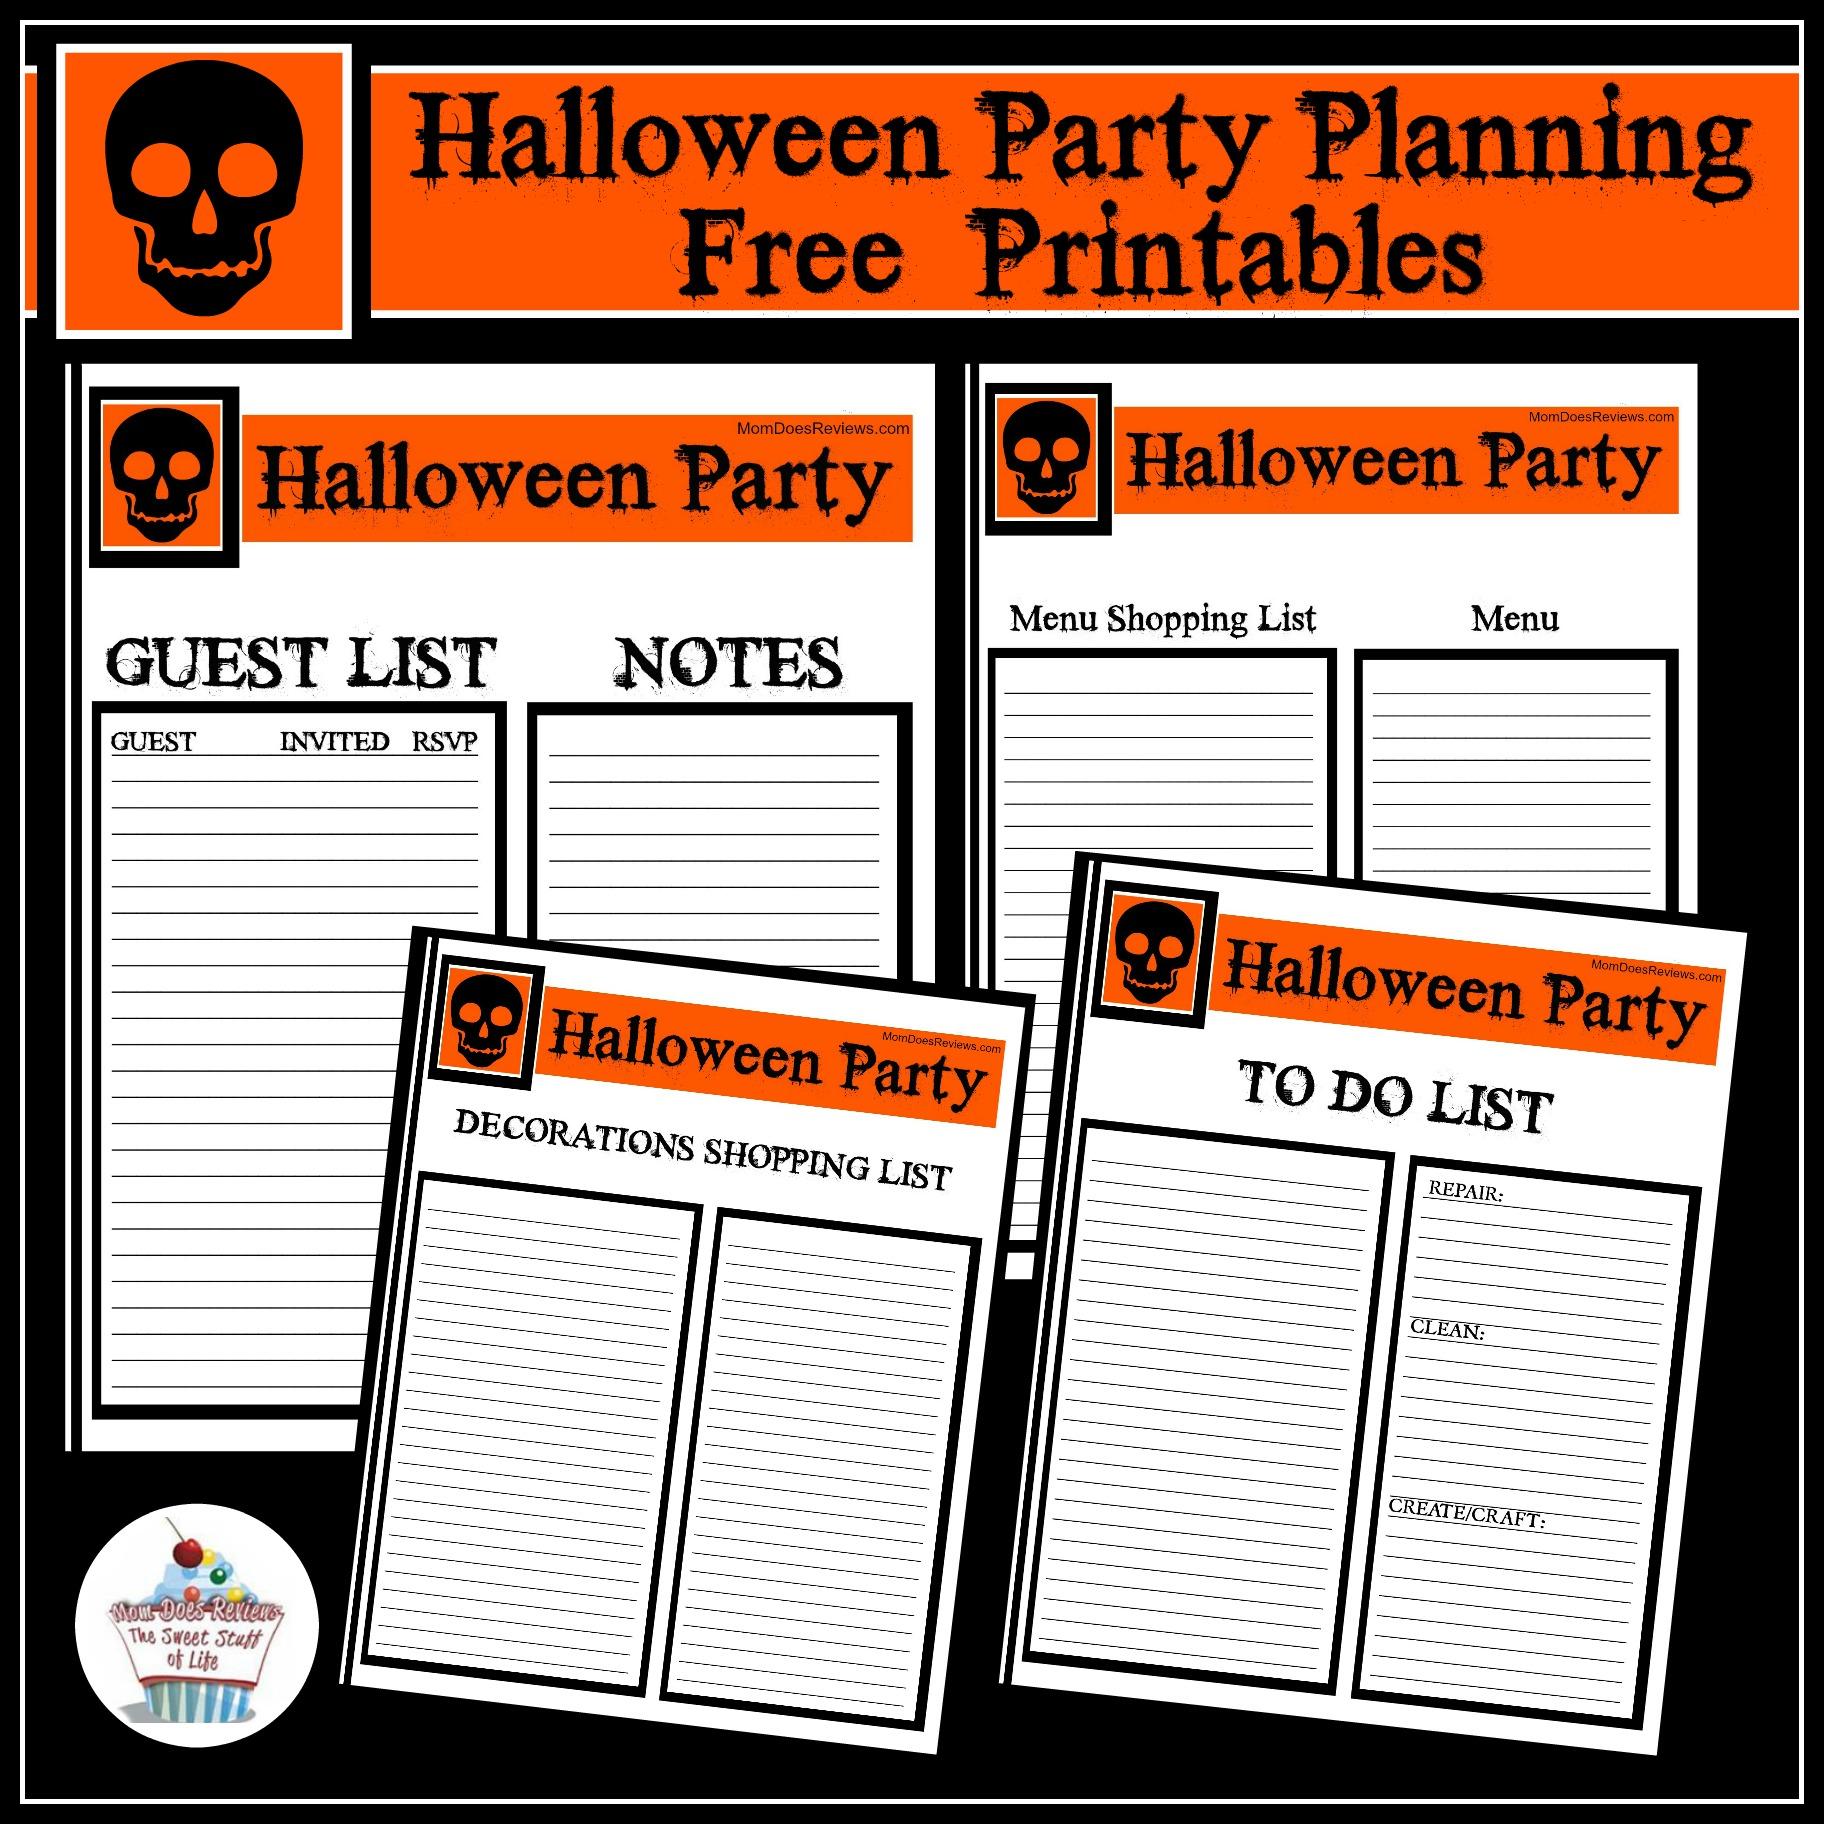 Halloween Party Planning Freeprintables